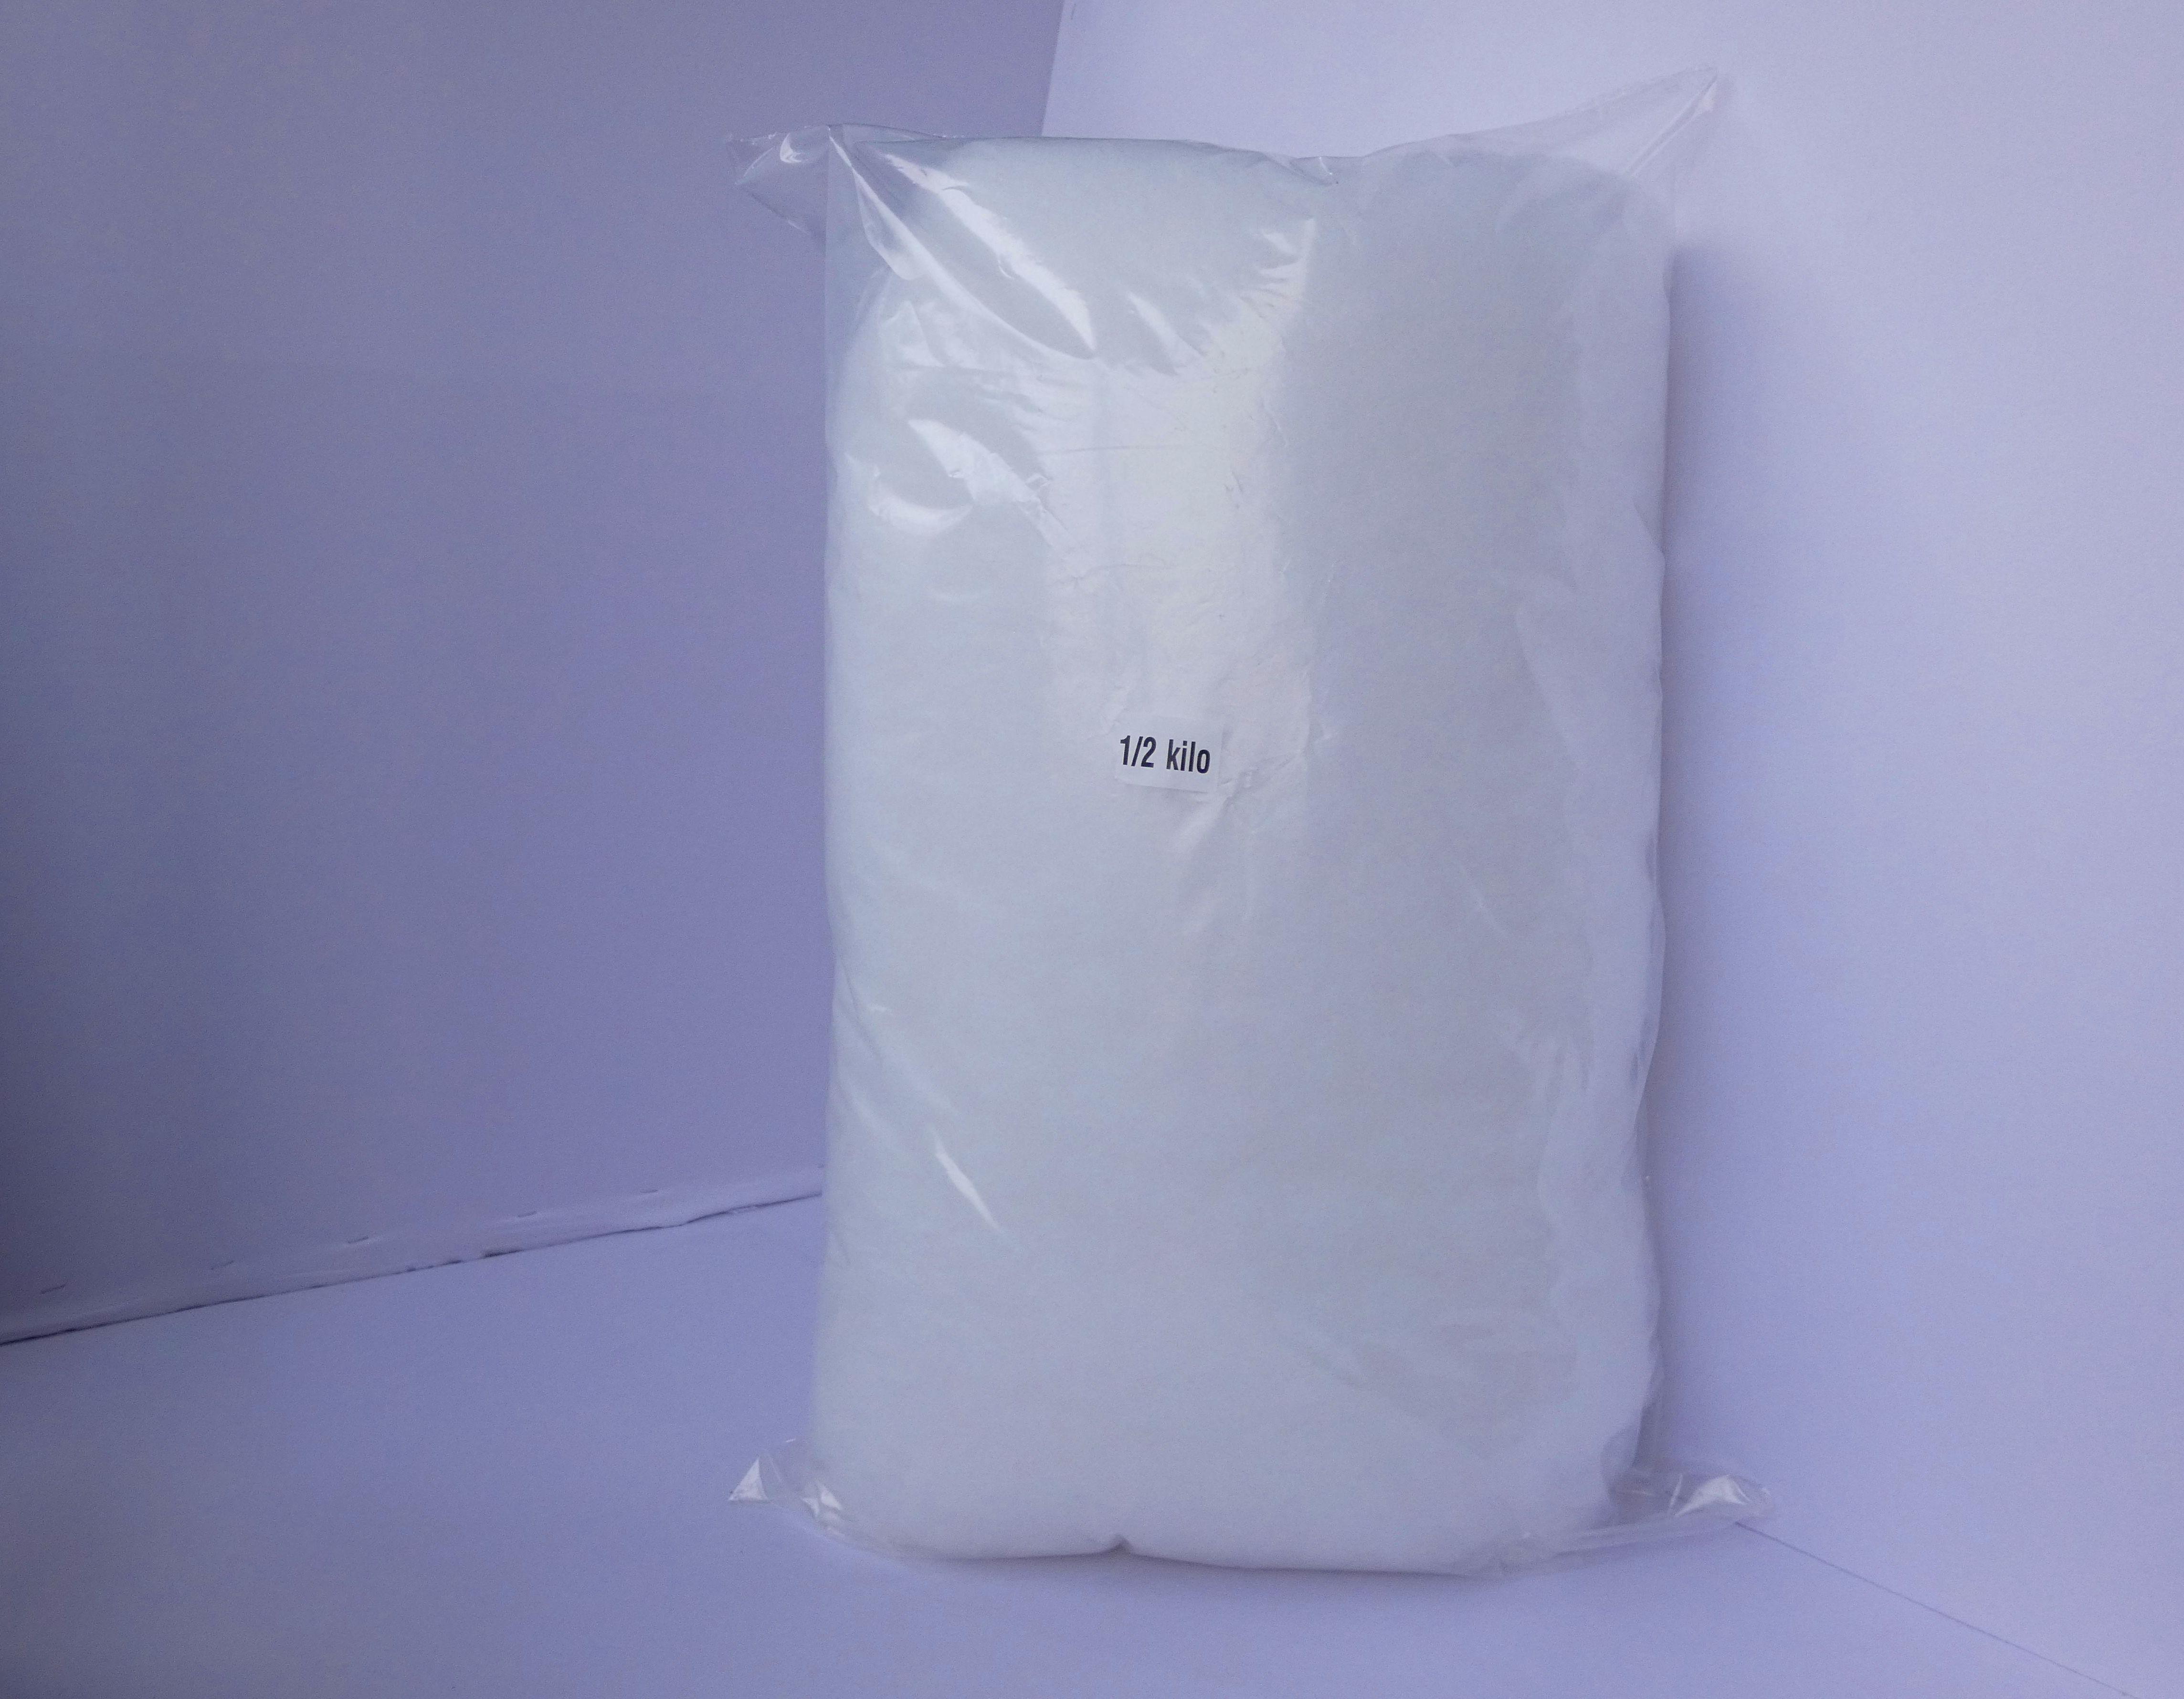 Bolsa 1kg / 500 gr / 5-10 kg: Productos de Almohadas Bellson